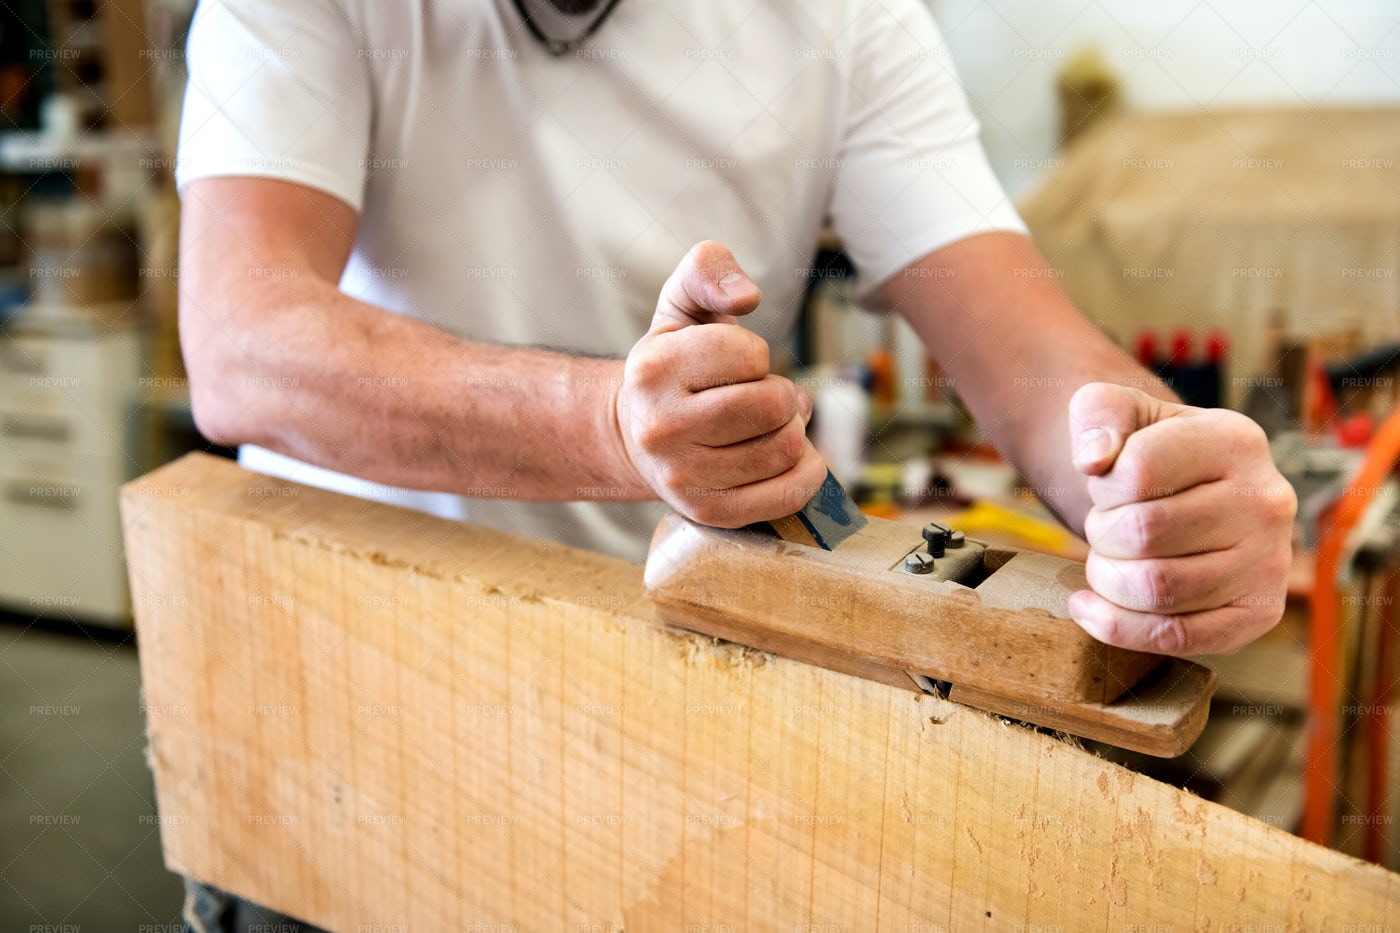 Carpenter Planing A Surface: Stock Photos